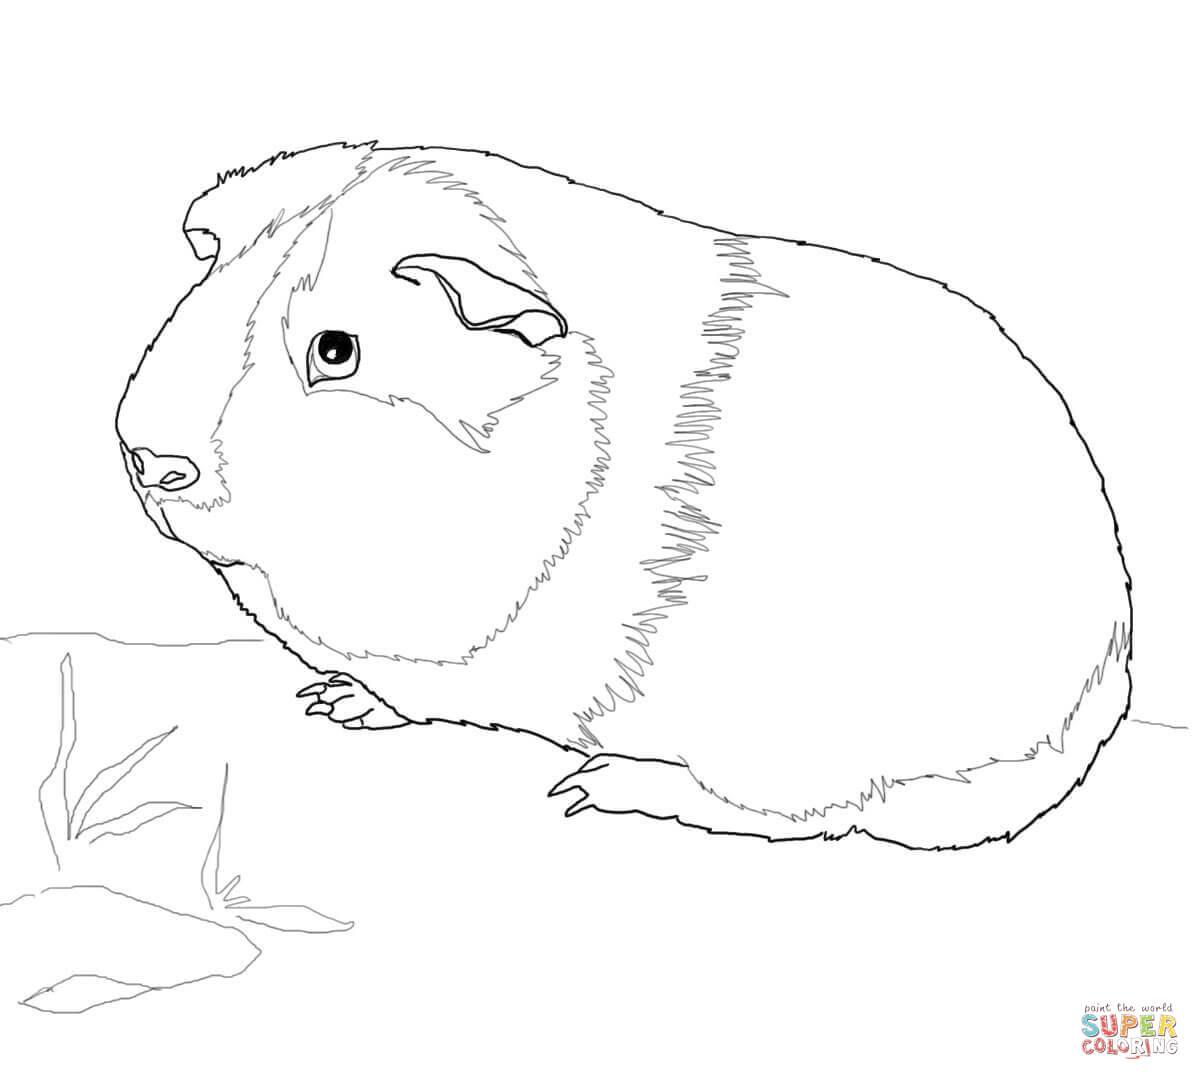 Ausmalbild: Süßes Meerschweinchen | Ausmalbilder Kostenlos bei Meerschweinchen Bilder Zum Ausmalen